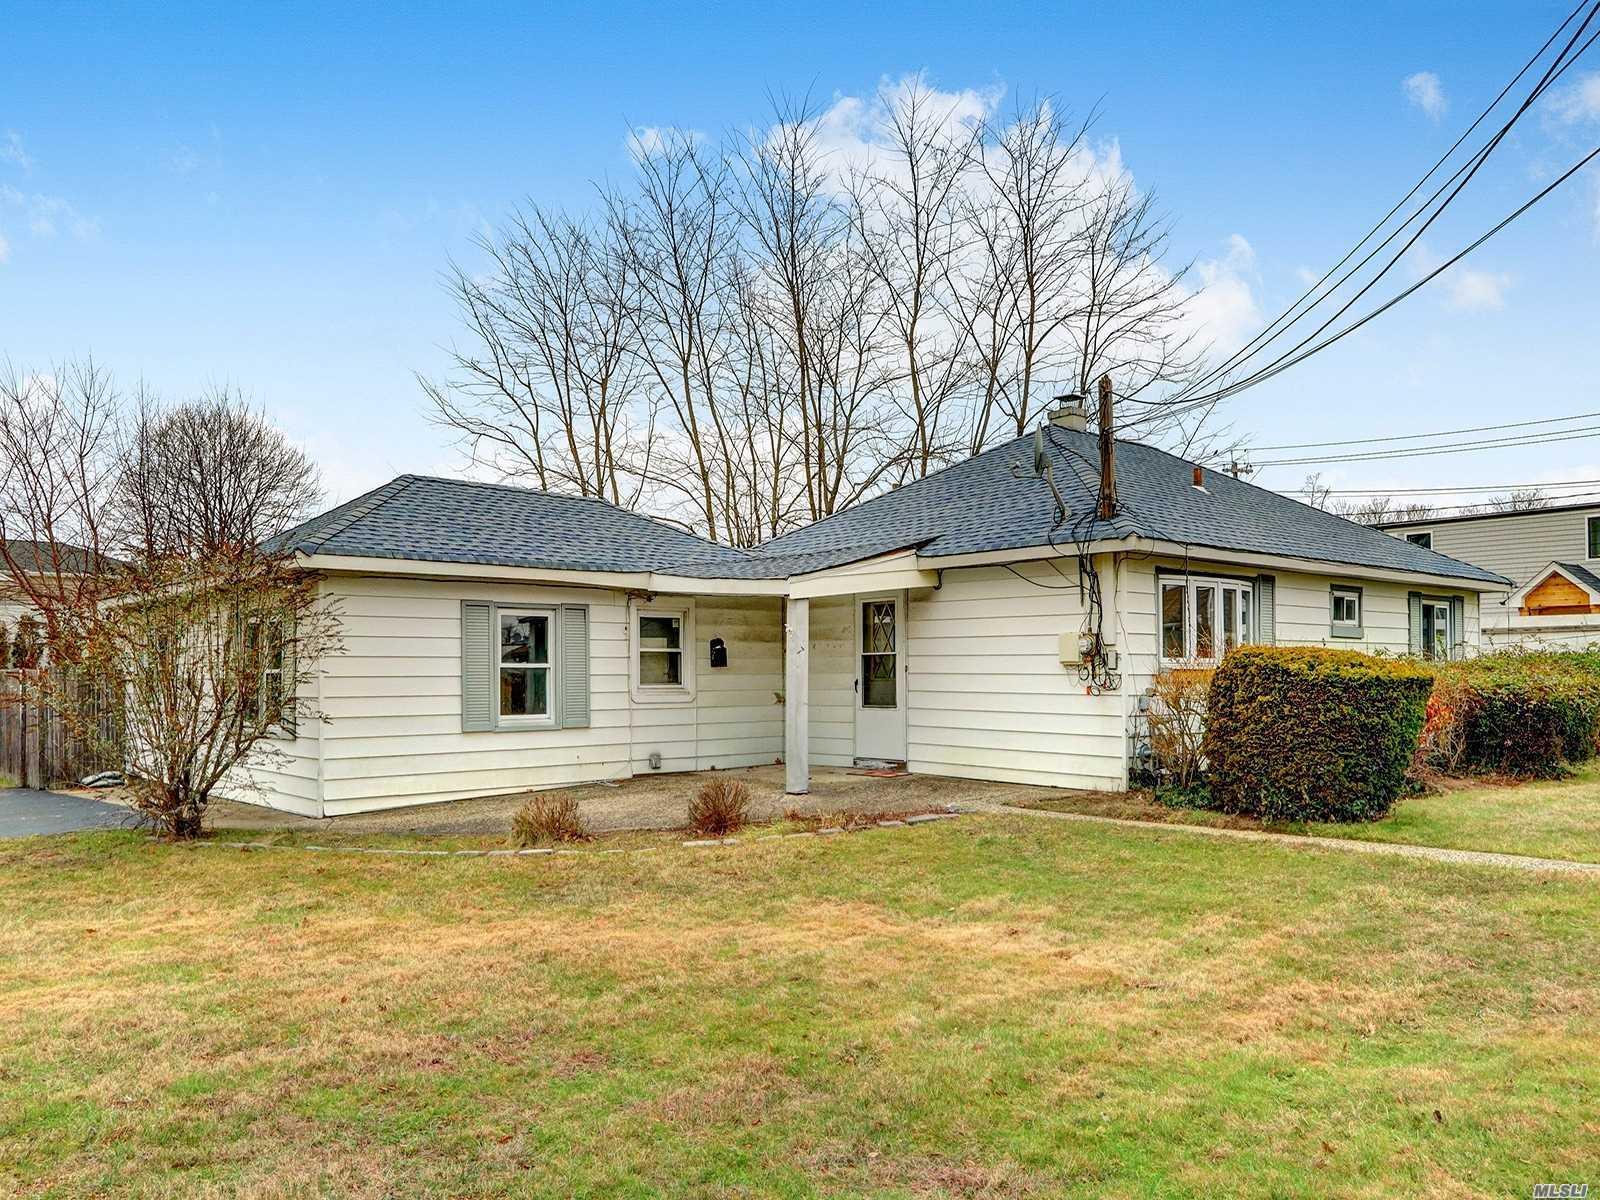 7 Algonquin Ave 11758 - One of Massapequa Homes for Sale